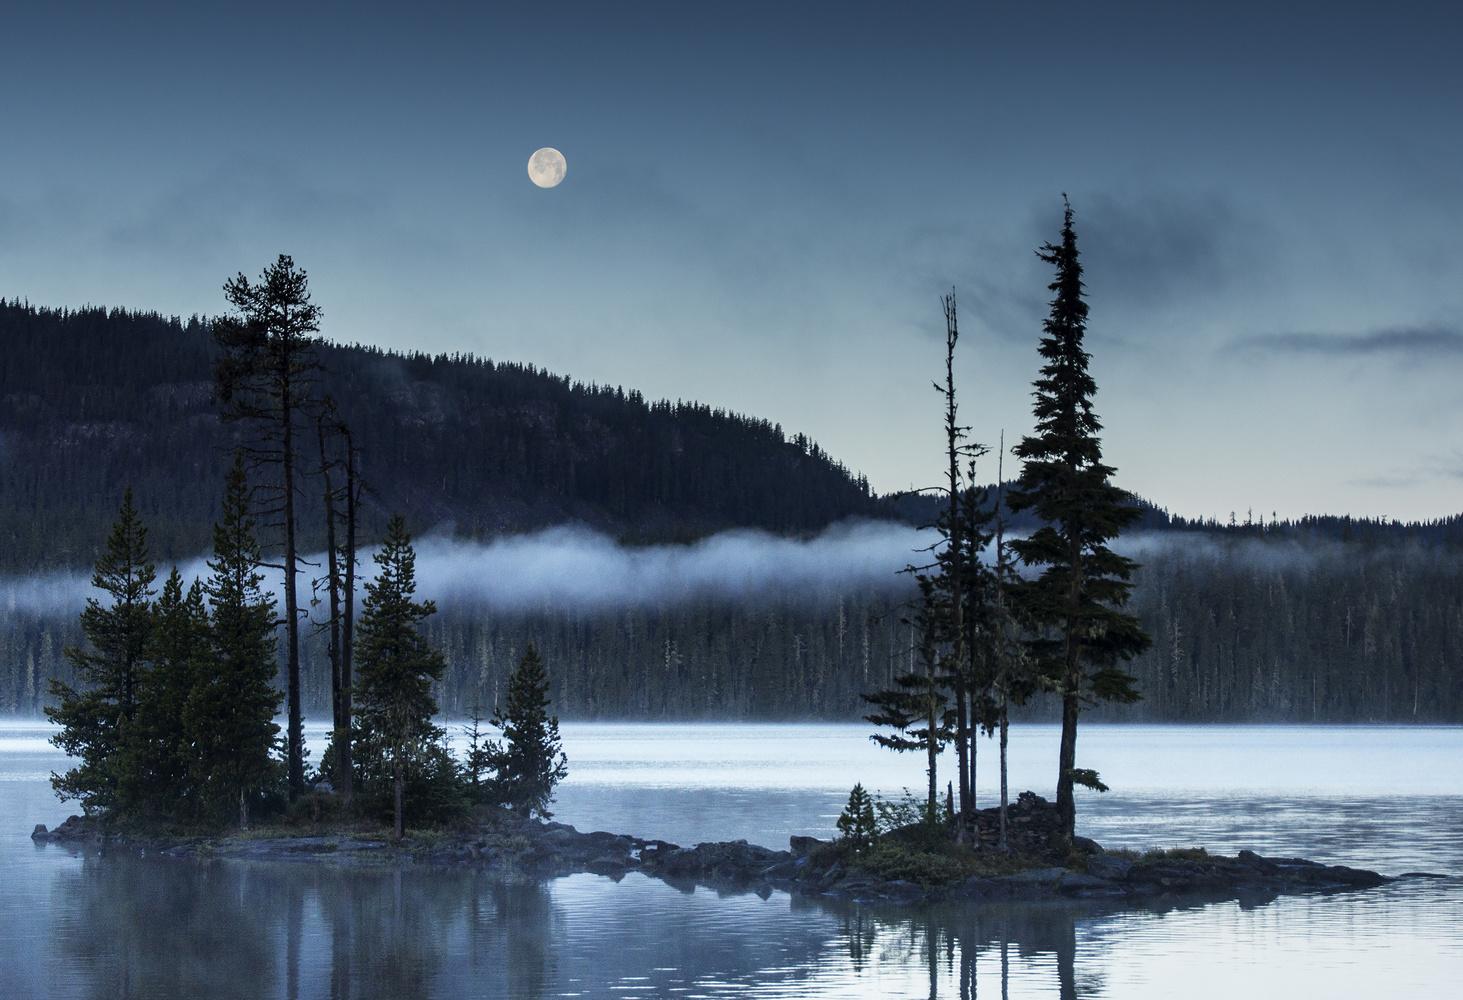 Full Moon Setting Over Waldo by Gary Horsfall